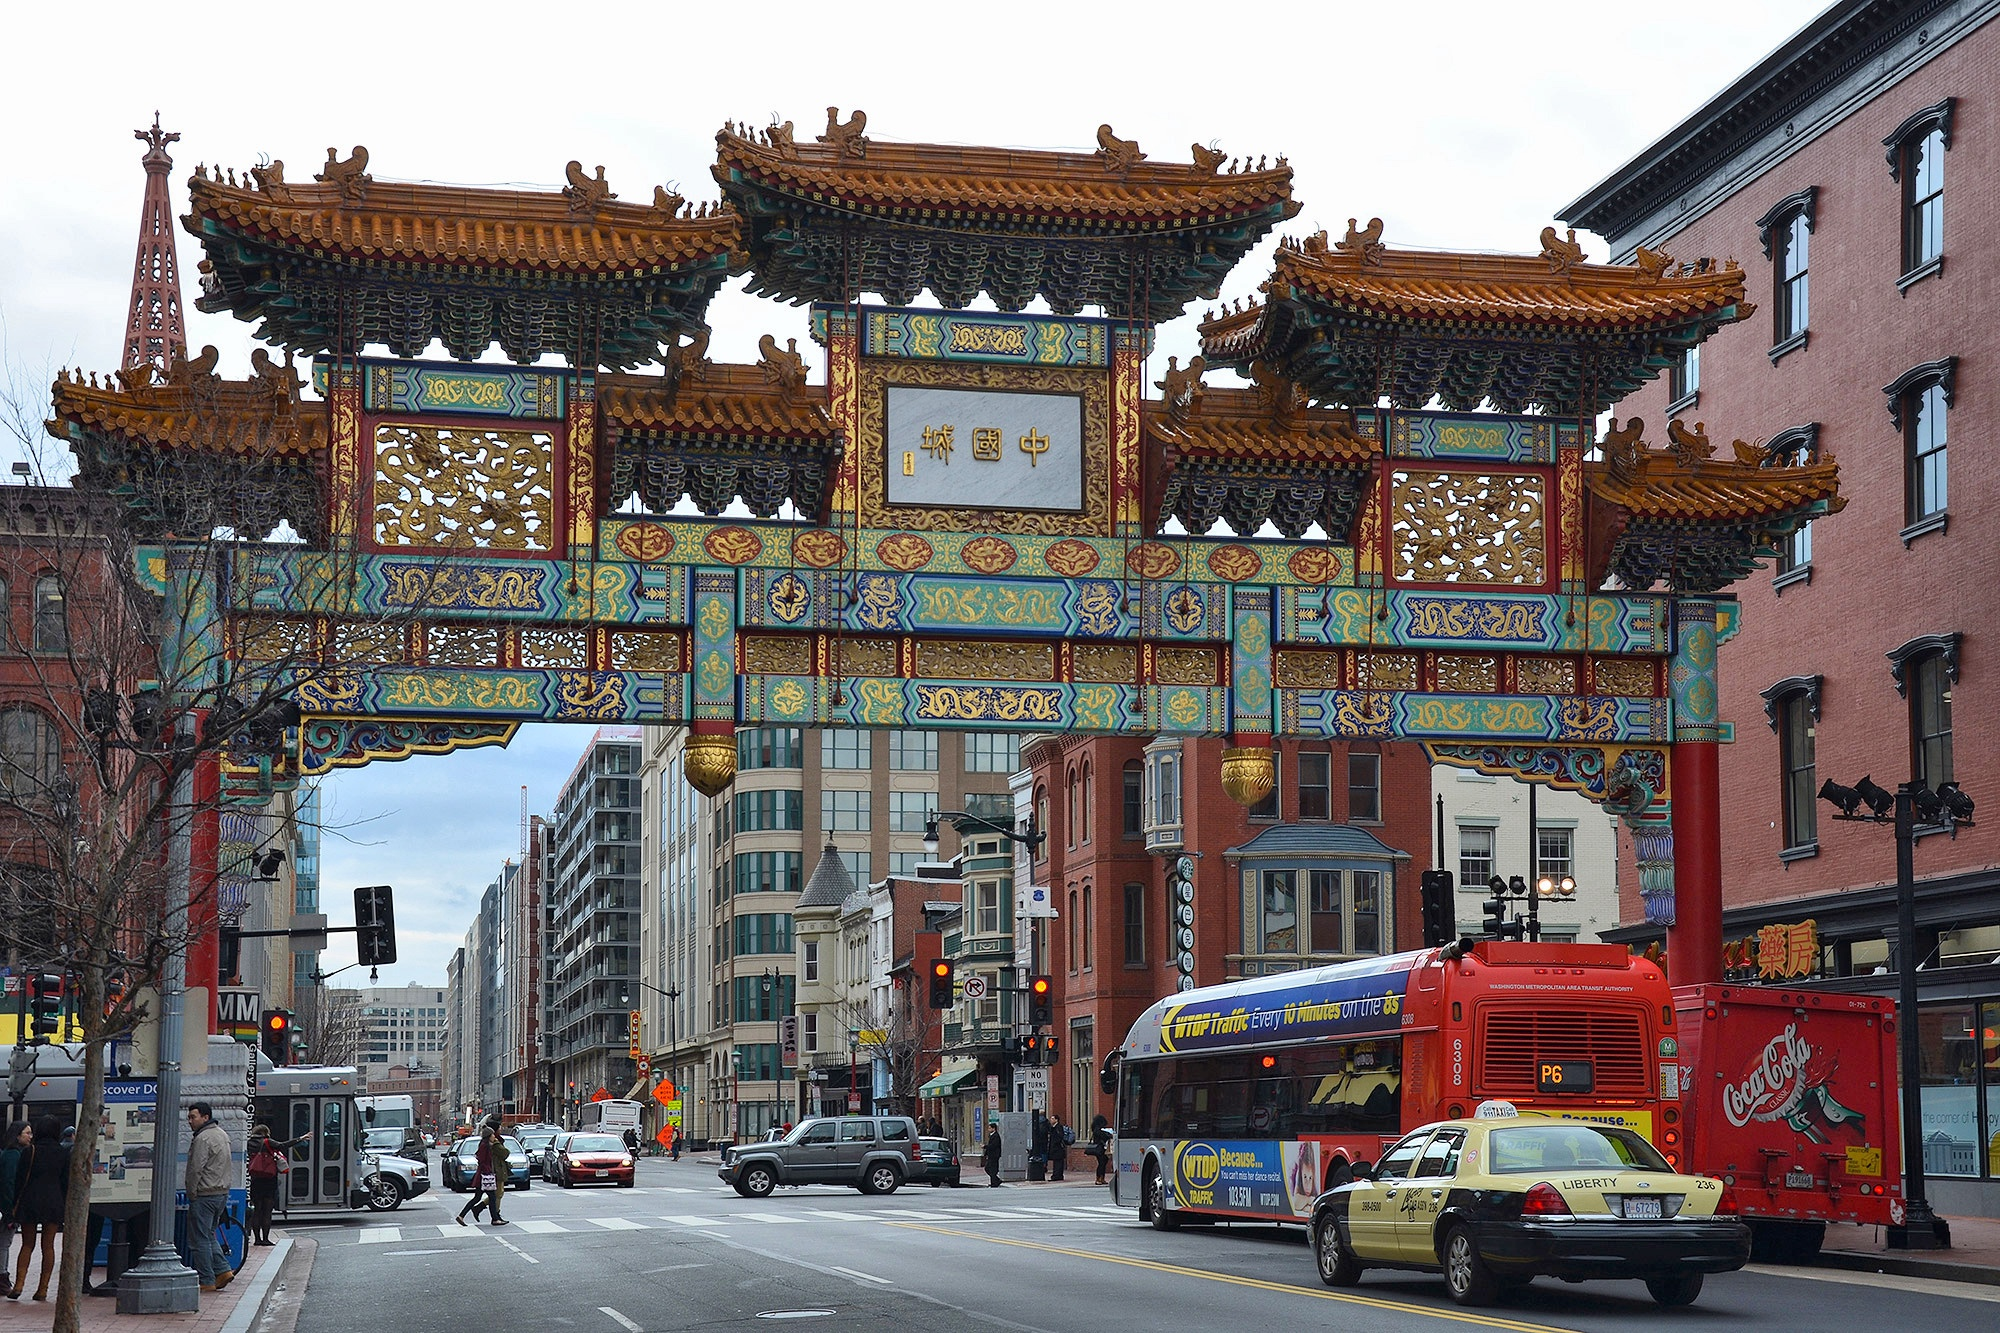 Chinatown Friendship Arch in Washington, Washington, USA